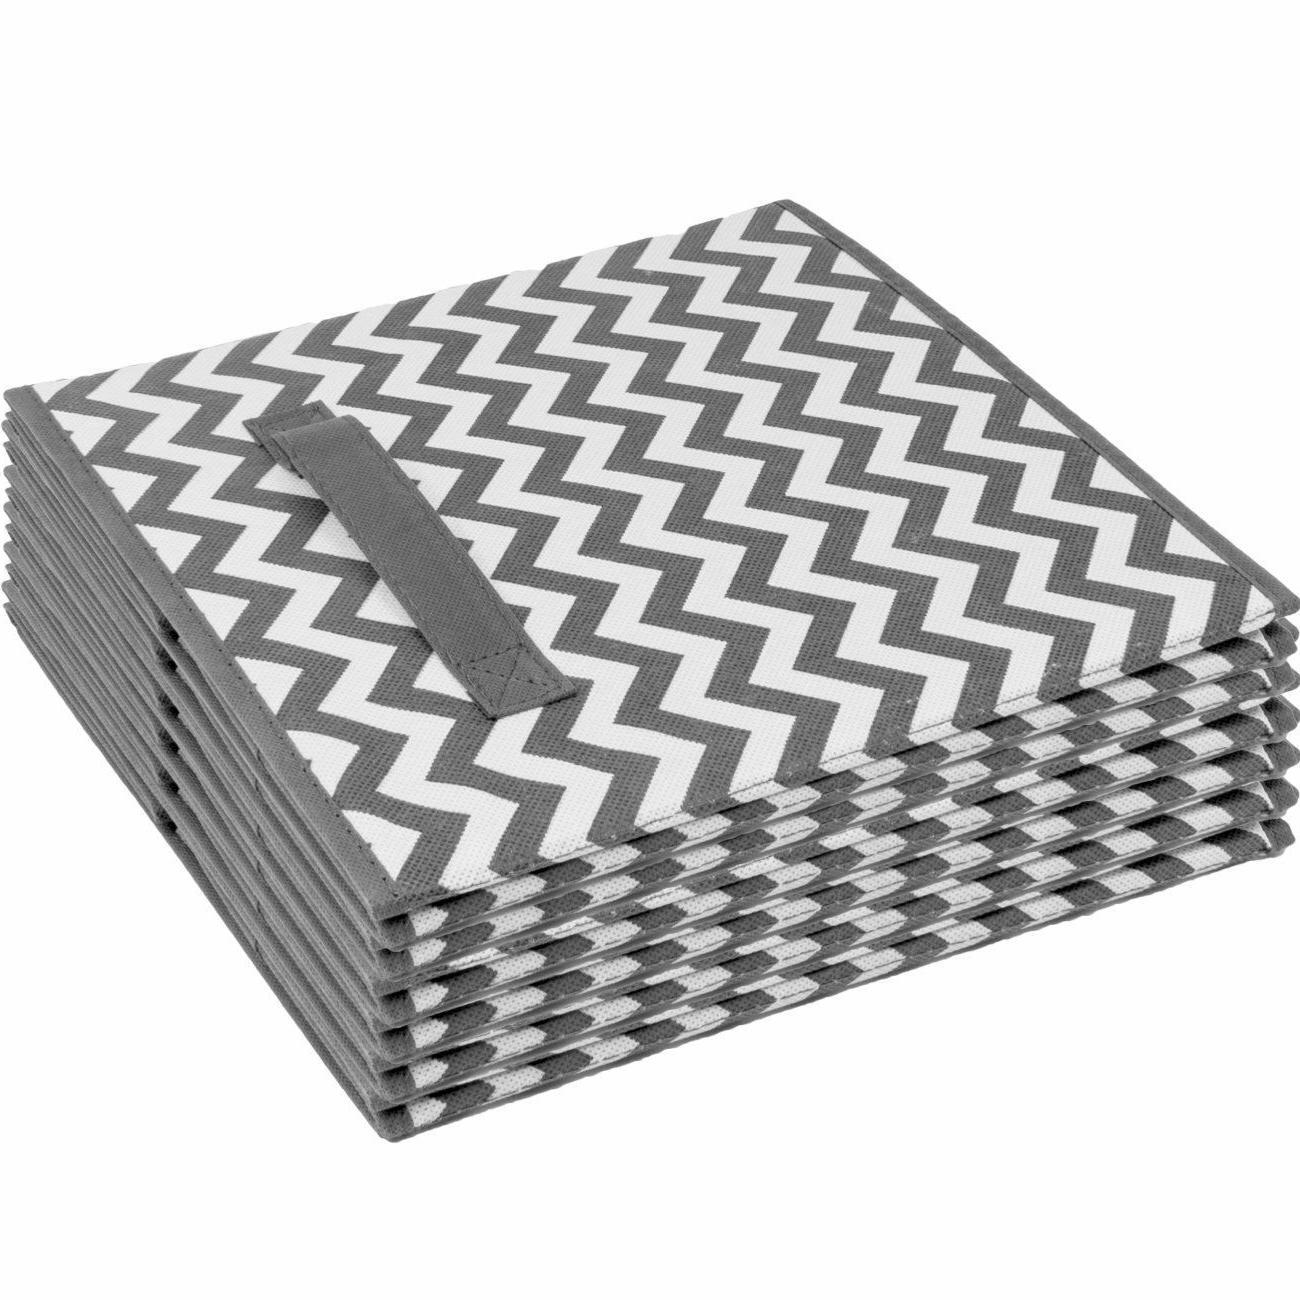 Foldable Bin, 6 Pack,Chevron Pattern